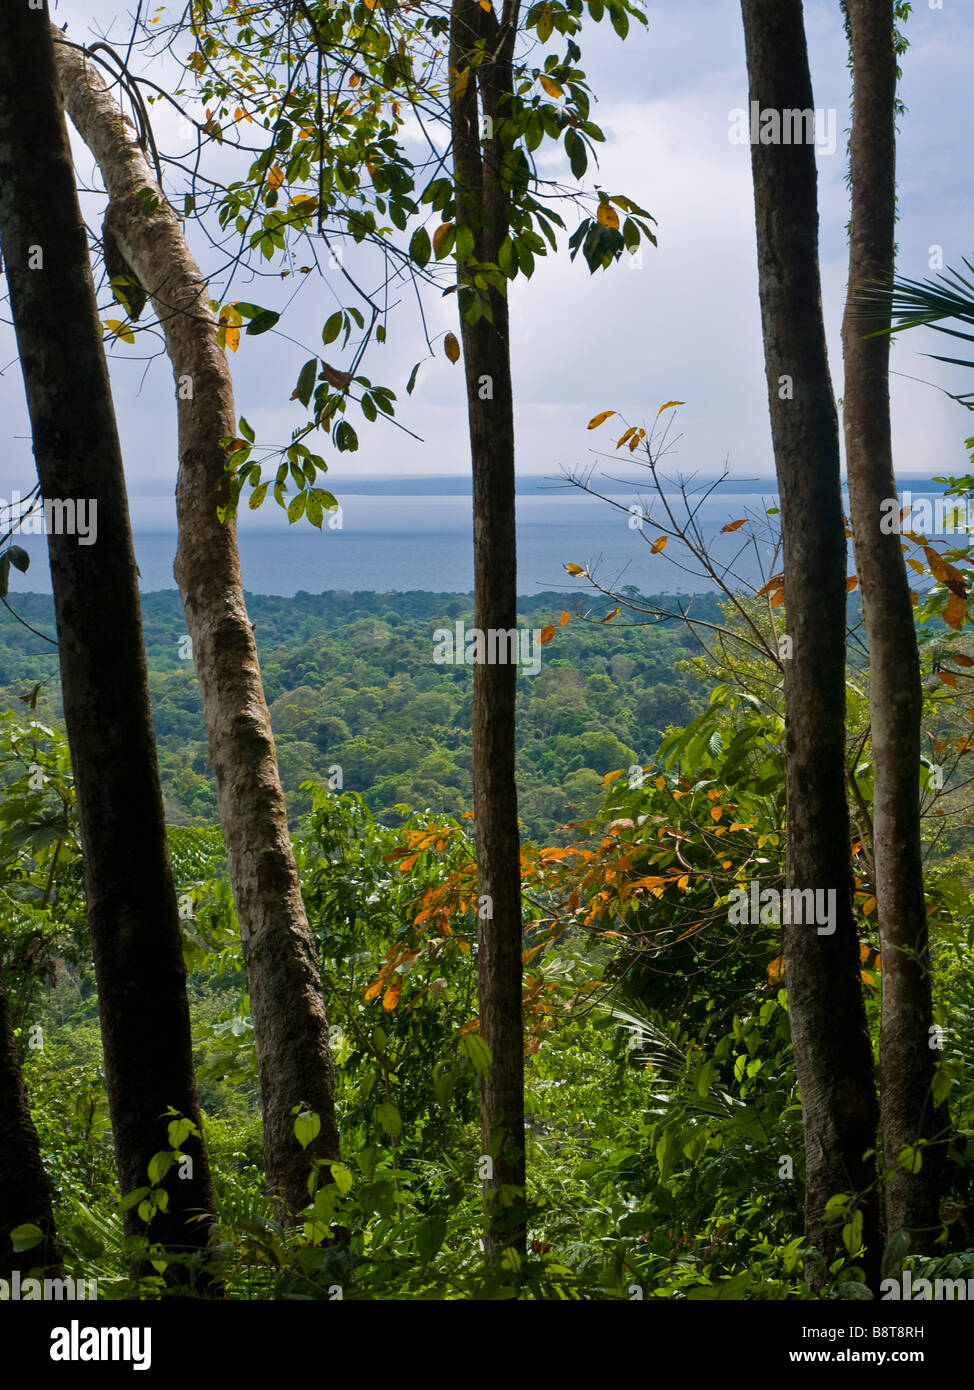 A view at the Tapajos river. Floresta Nacional do Tapajos, near Santarem, Para state, Brazil. Stock Photo